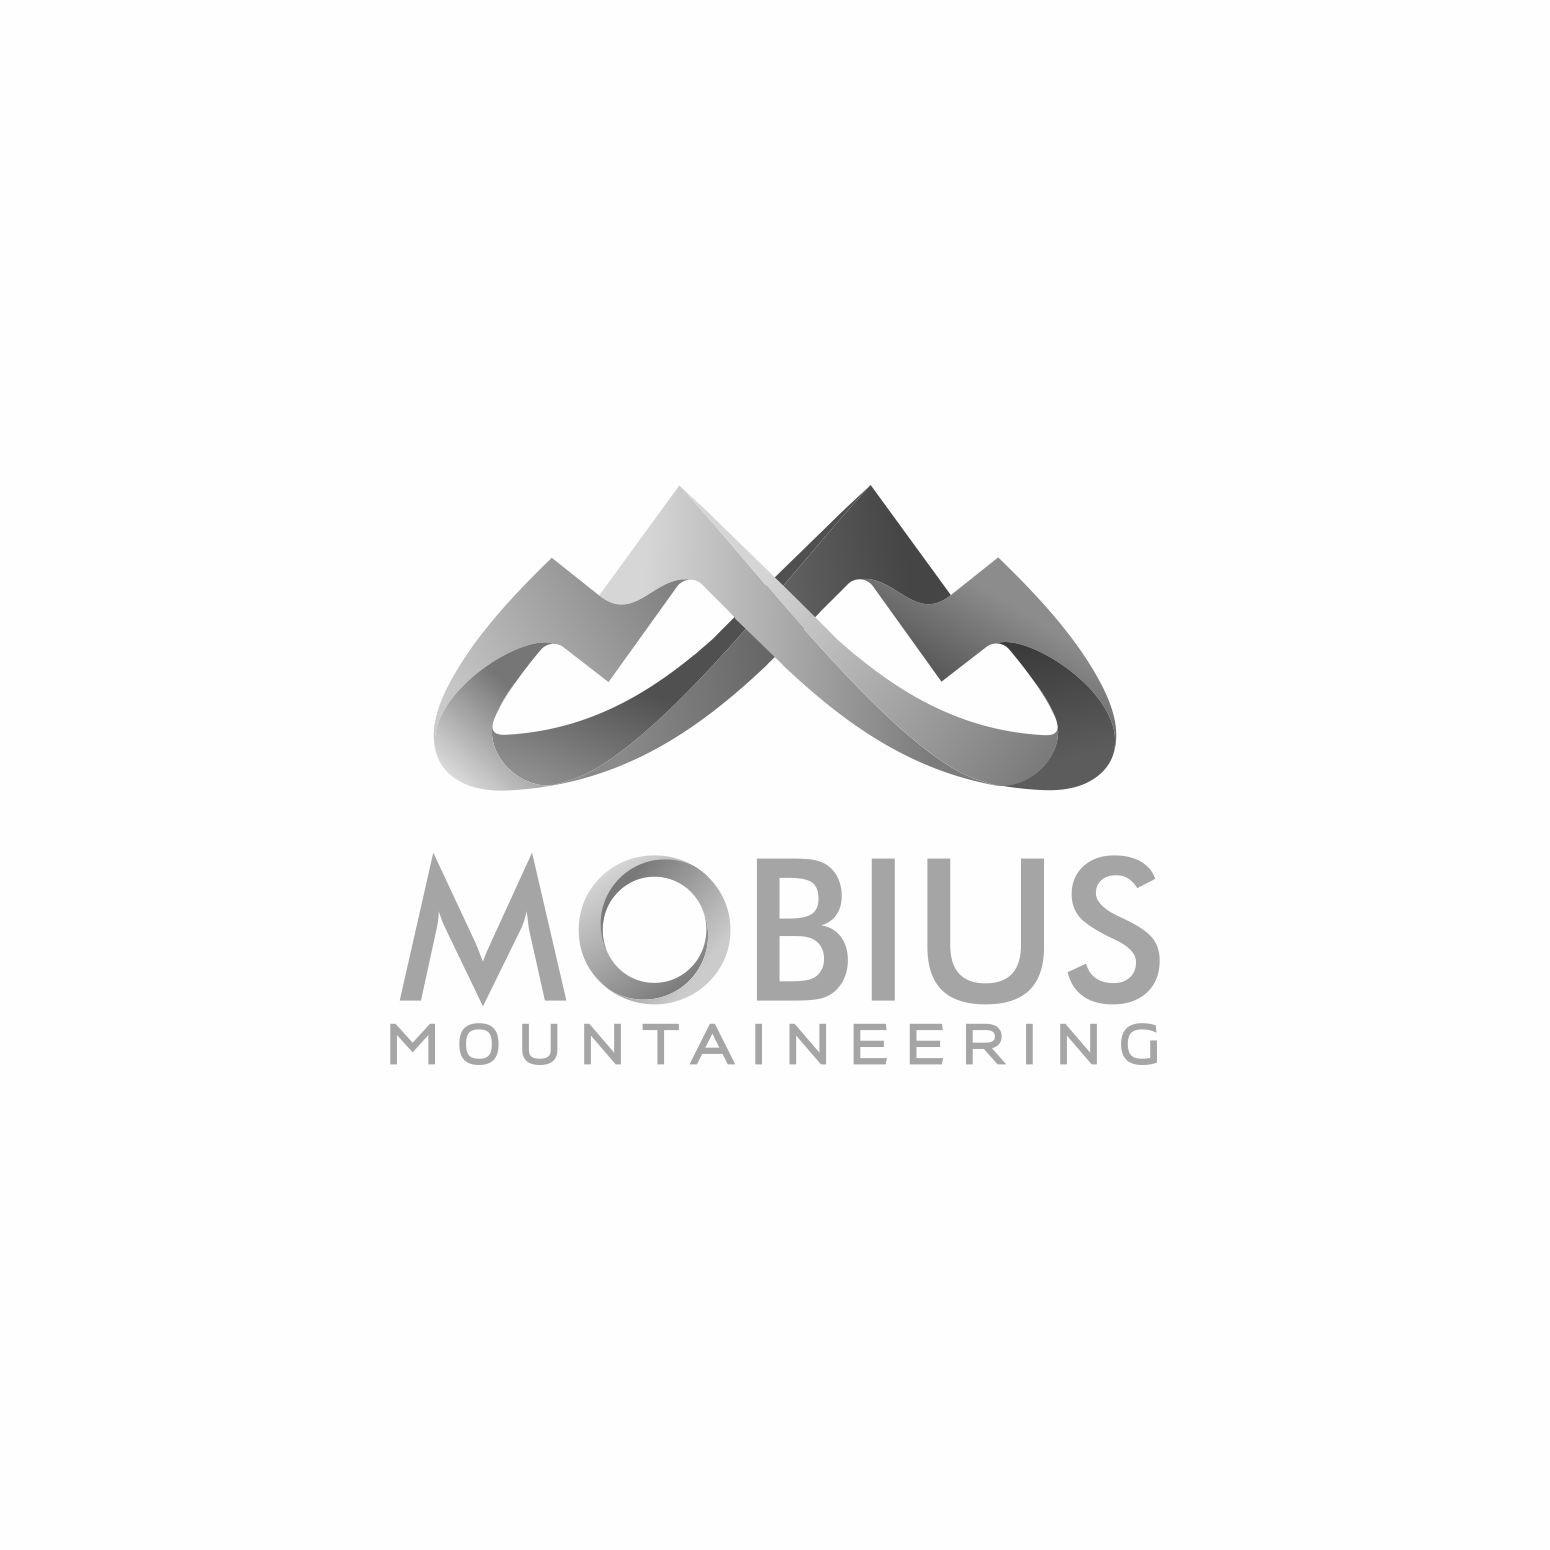 Mobius Mountaineering - Expert mountain guides forging partnerships through adventure.